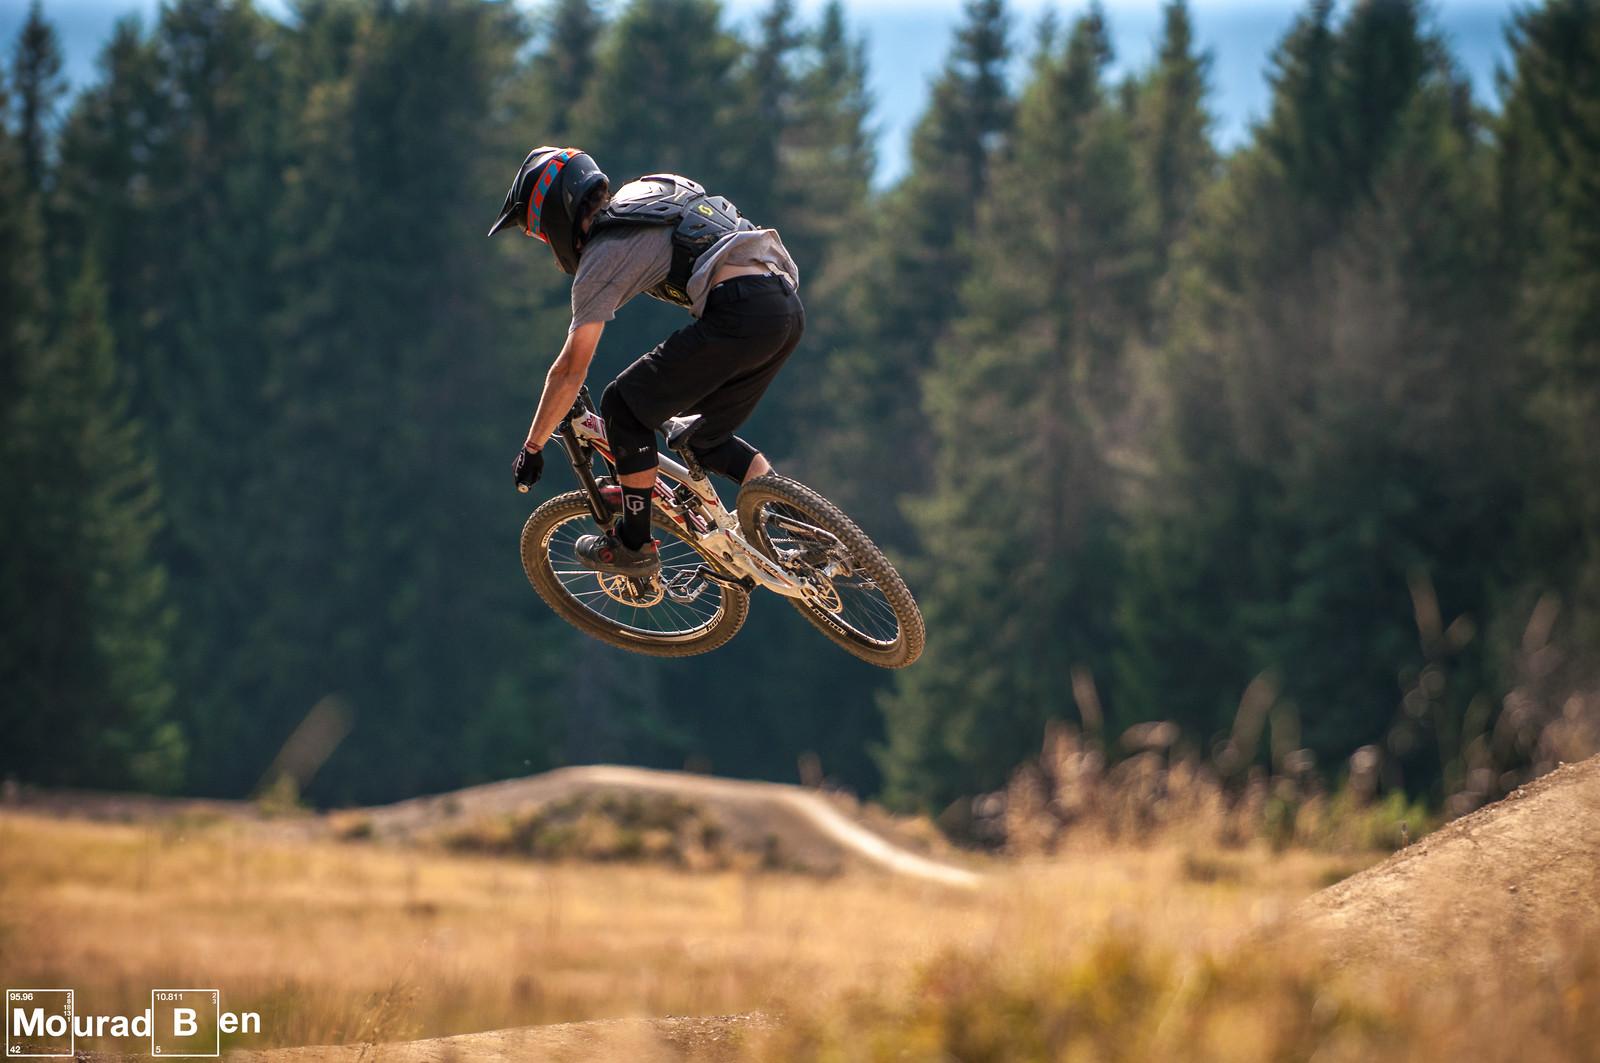 Bottine - Romuald_Manach - Mountain Biking Pictures - Vital MTB